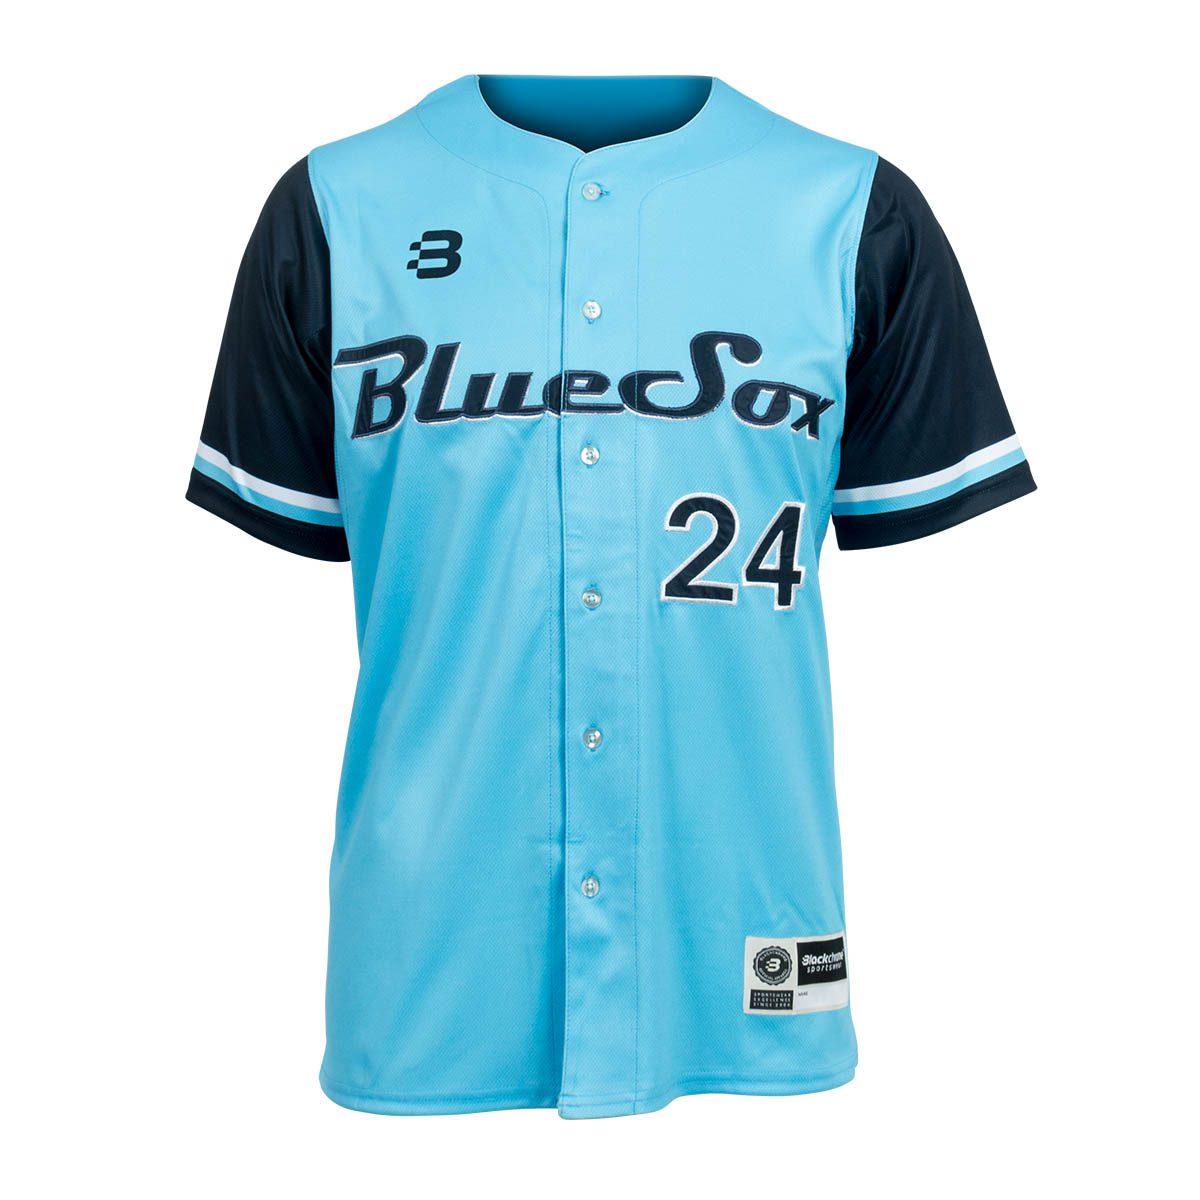 Baseball Tackle Twill Jersey - Blue Sox - Front